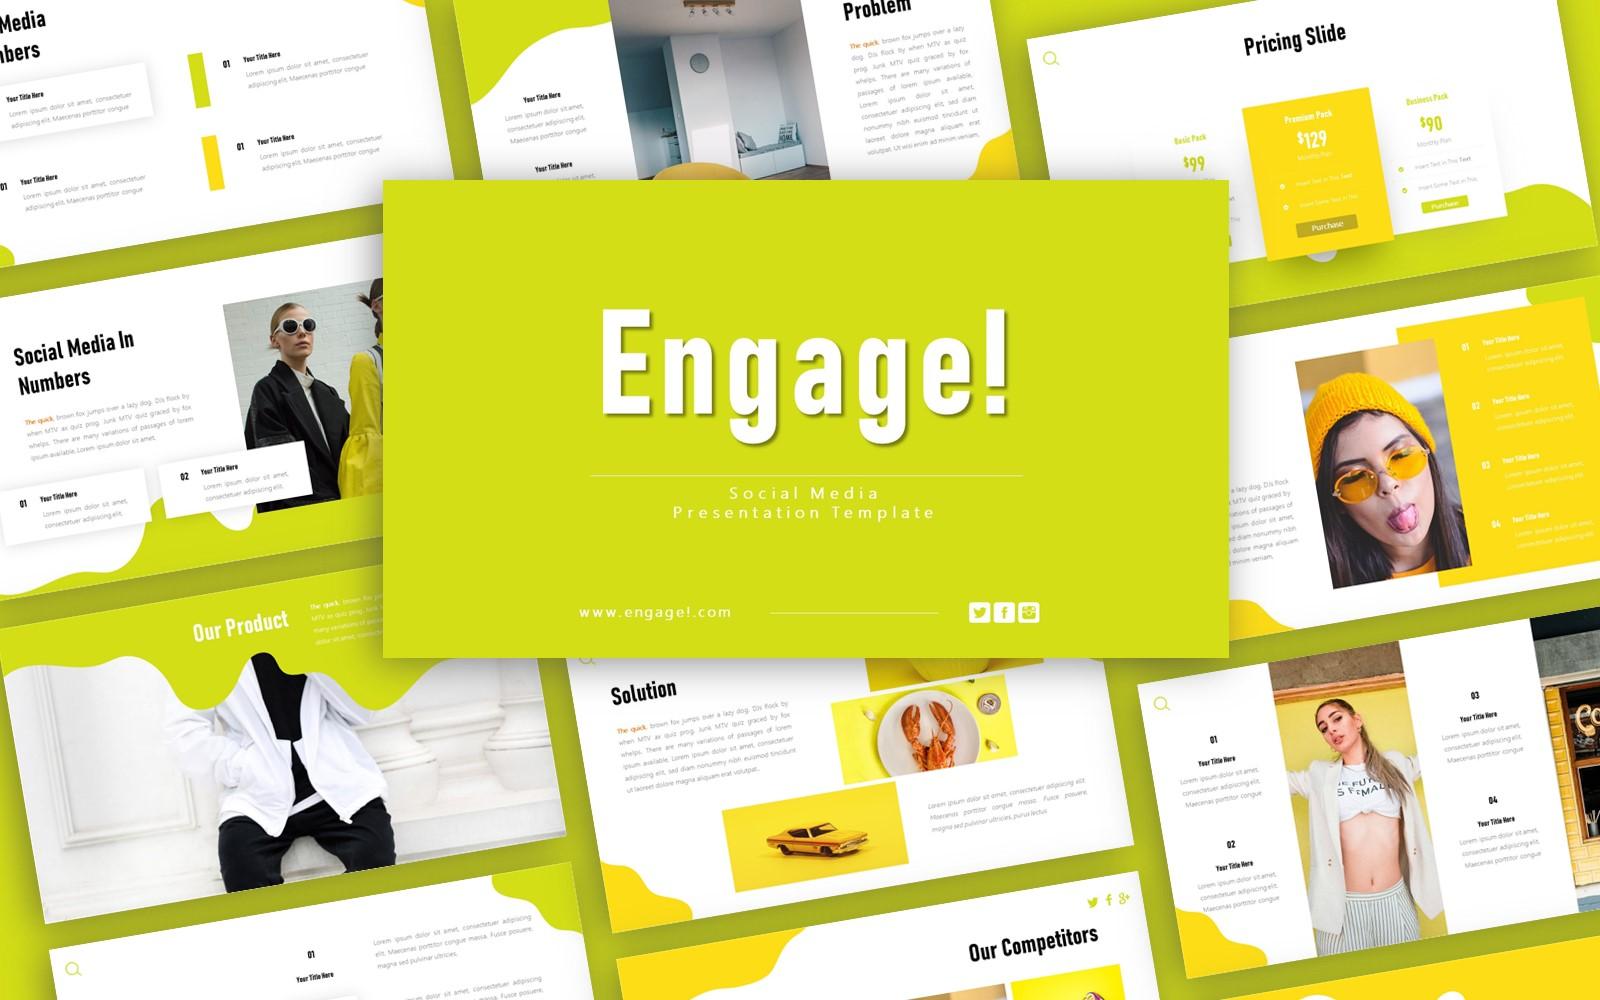 Engage Social Media Presentation №125948